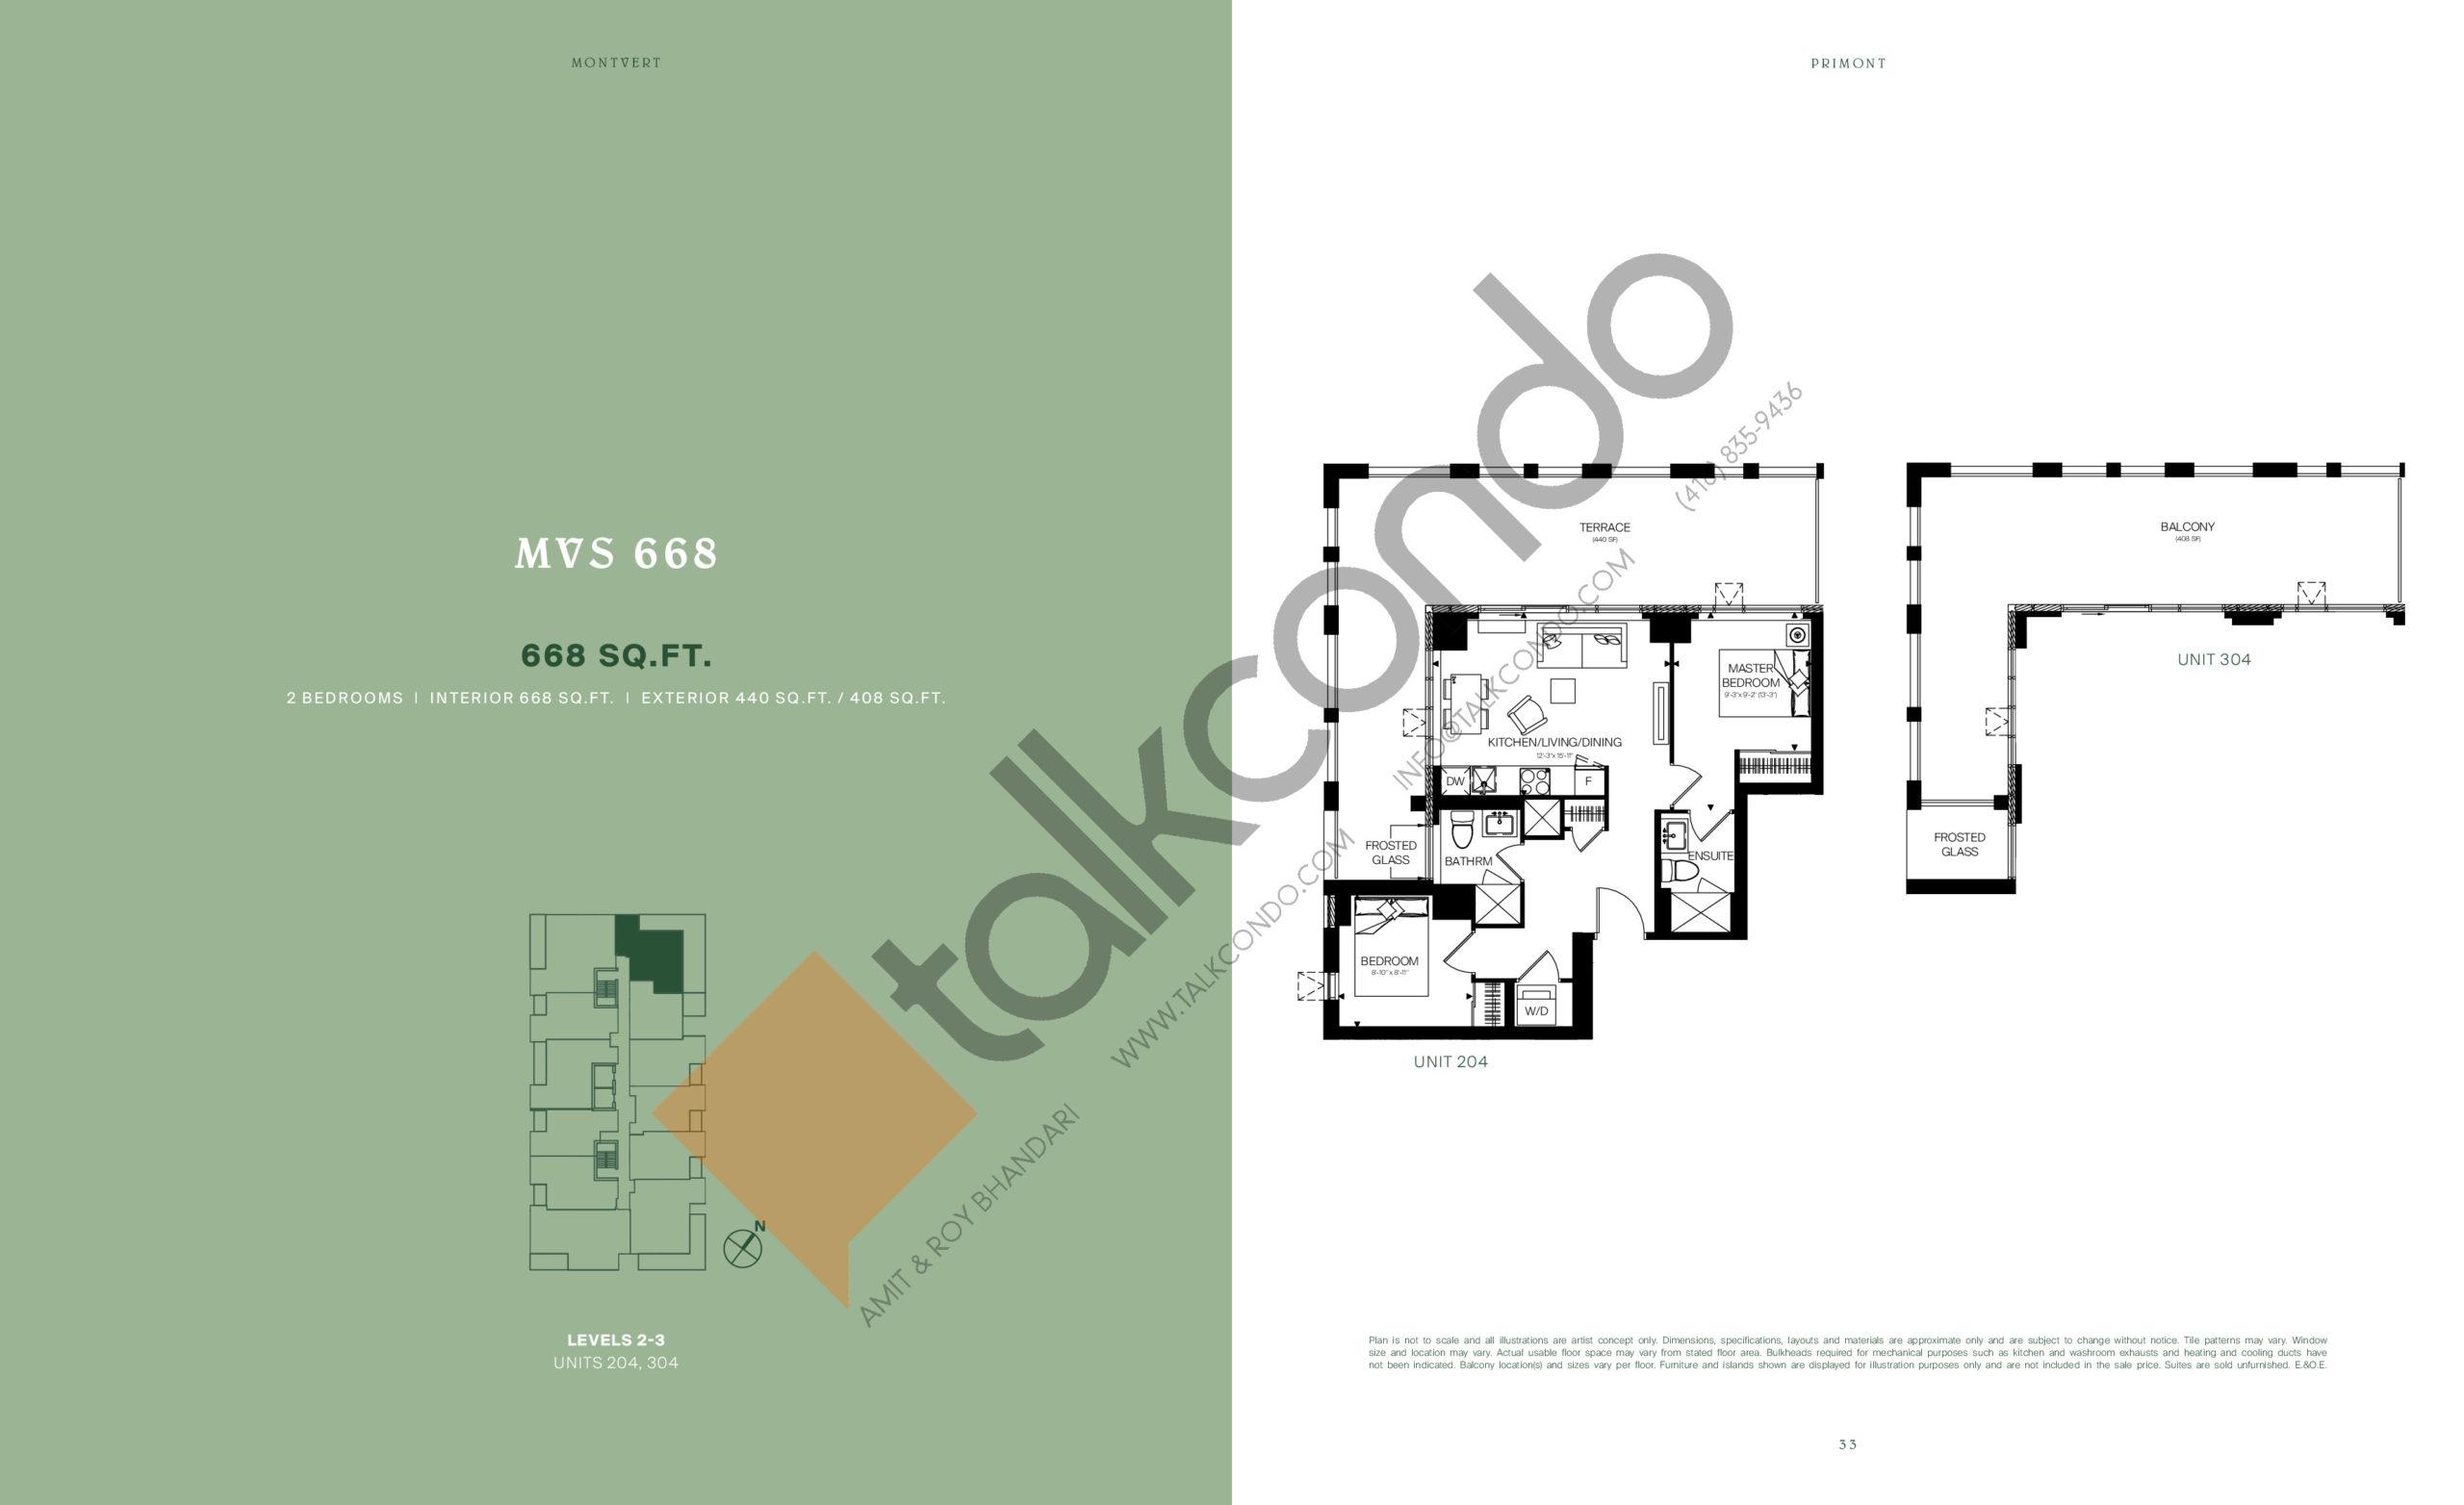 MVS 668 Floor Plan at MontVert Condos - 668 sq.ft